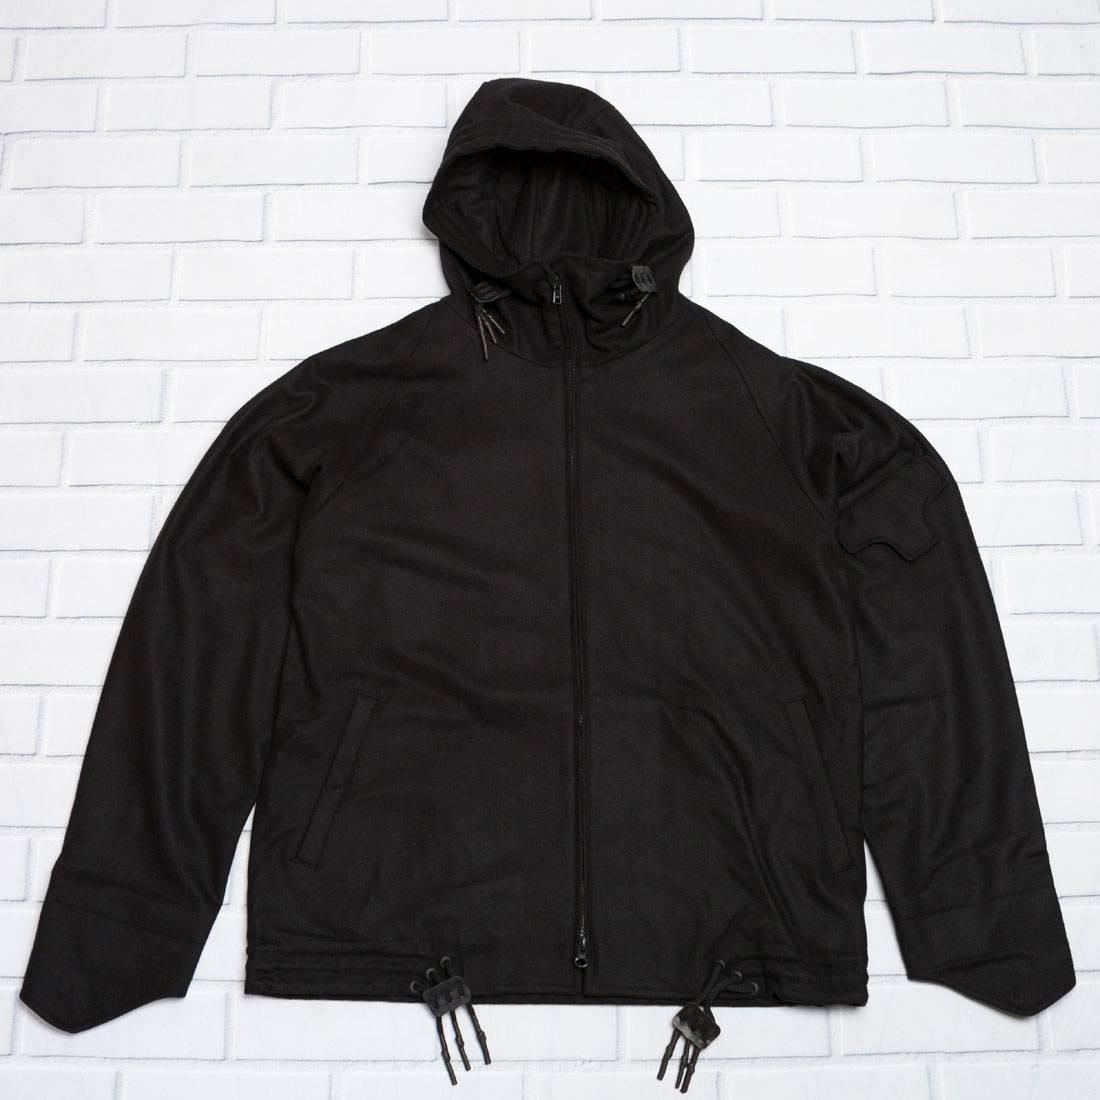 Adidas Y-3 Men 3-Stripes Wool Jacket (black)